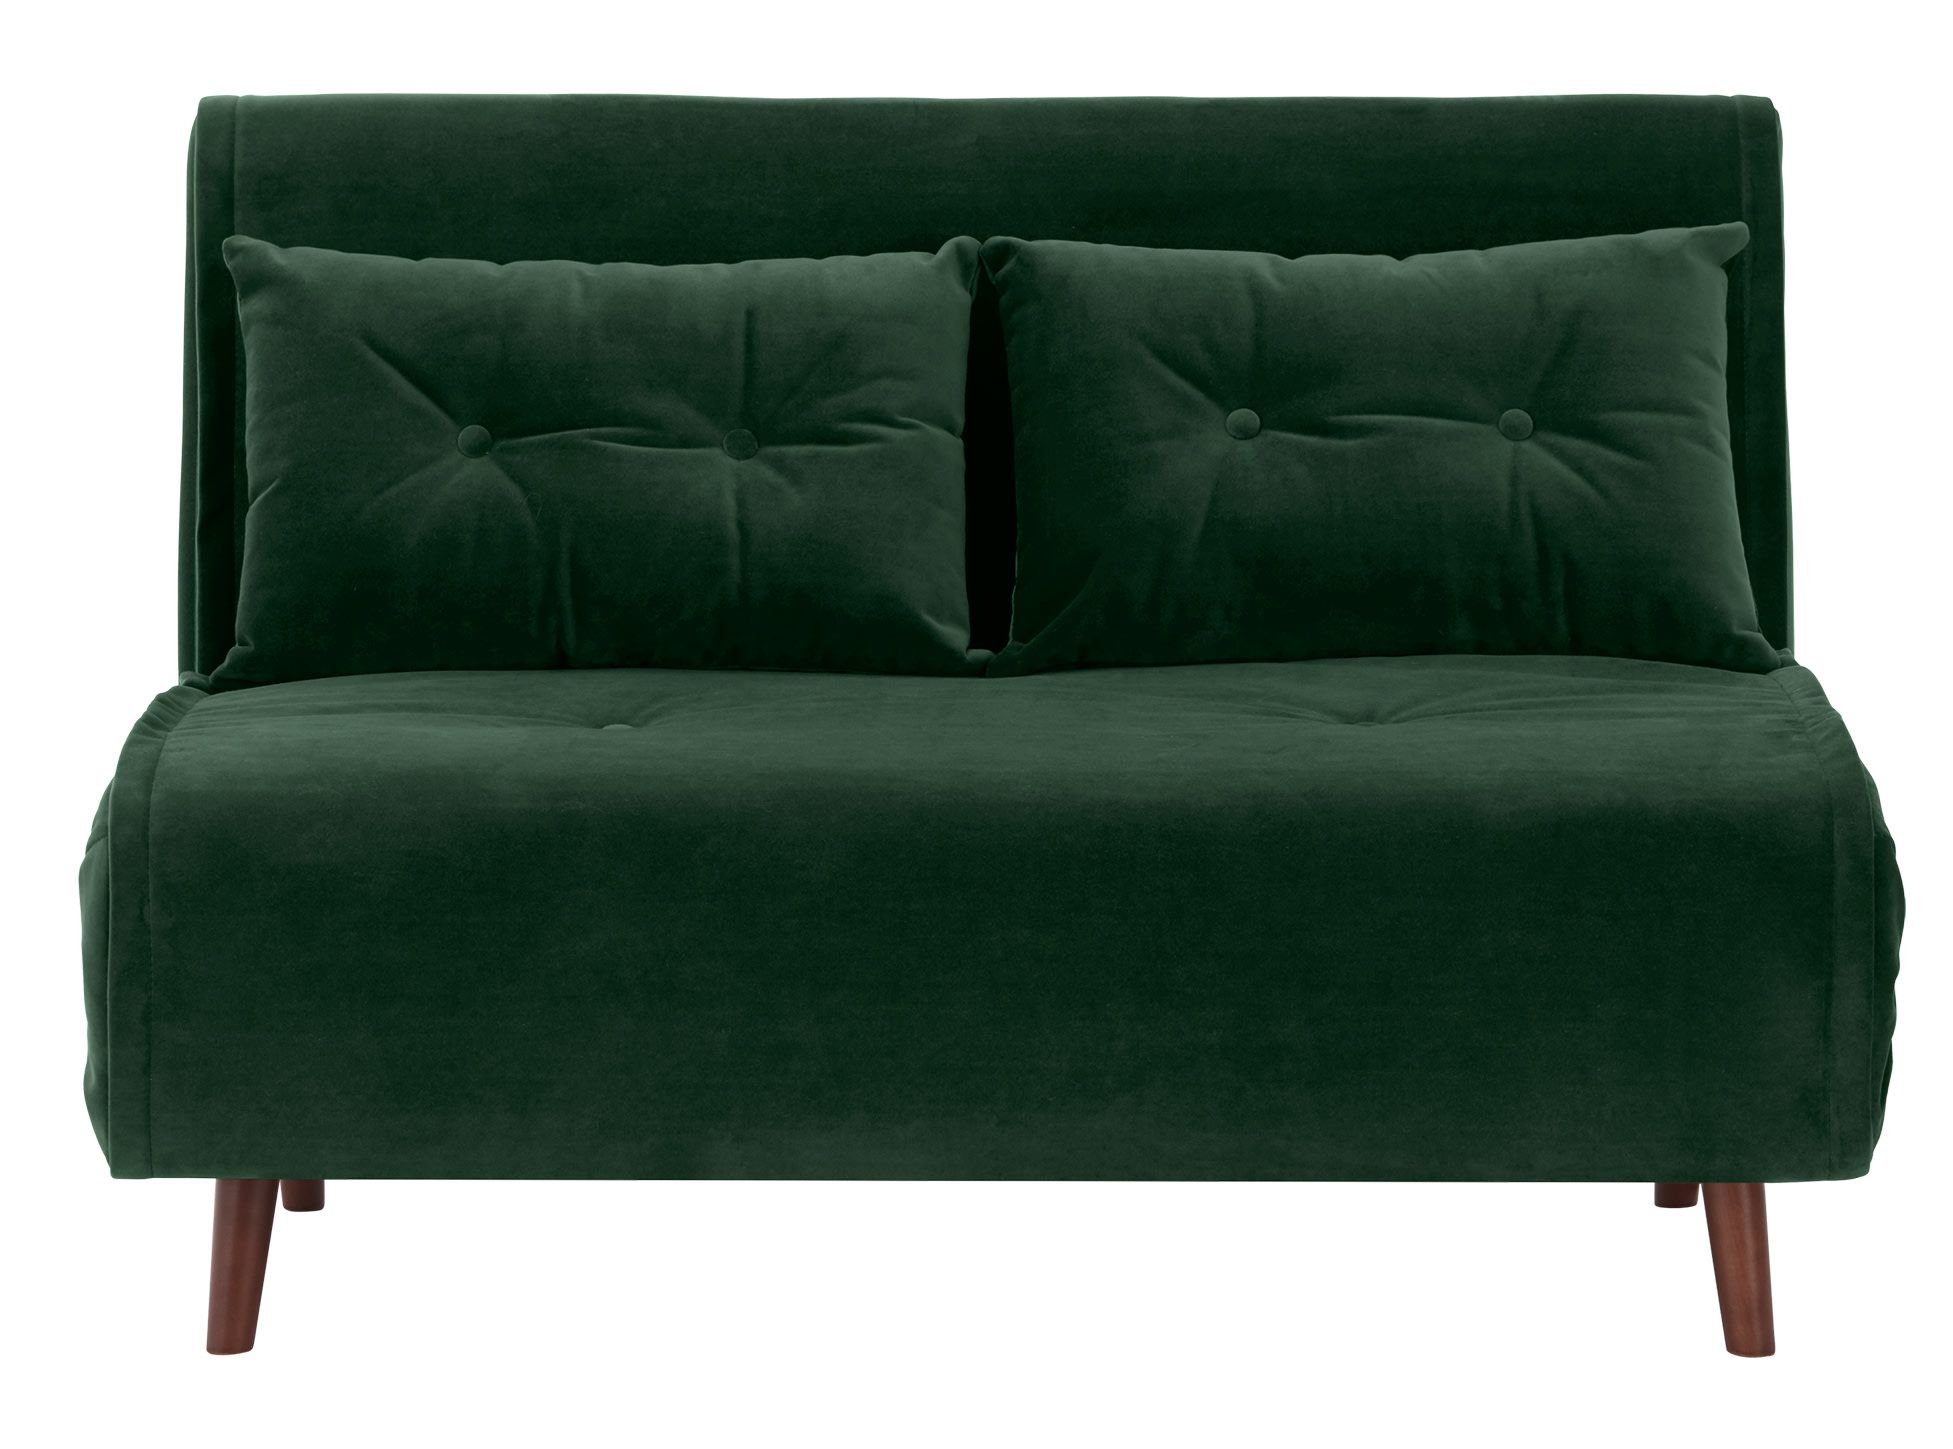 Magnificent Made Pine Green Velvet Sofa Bed Ldn Flat In 2019 Sofa Machost Co Dining Chair Design Ideas Machostcouk